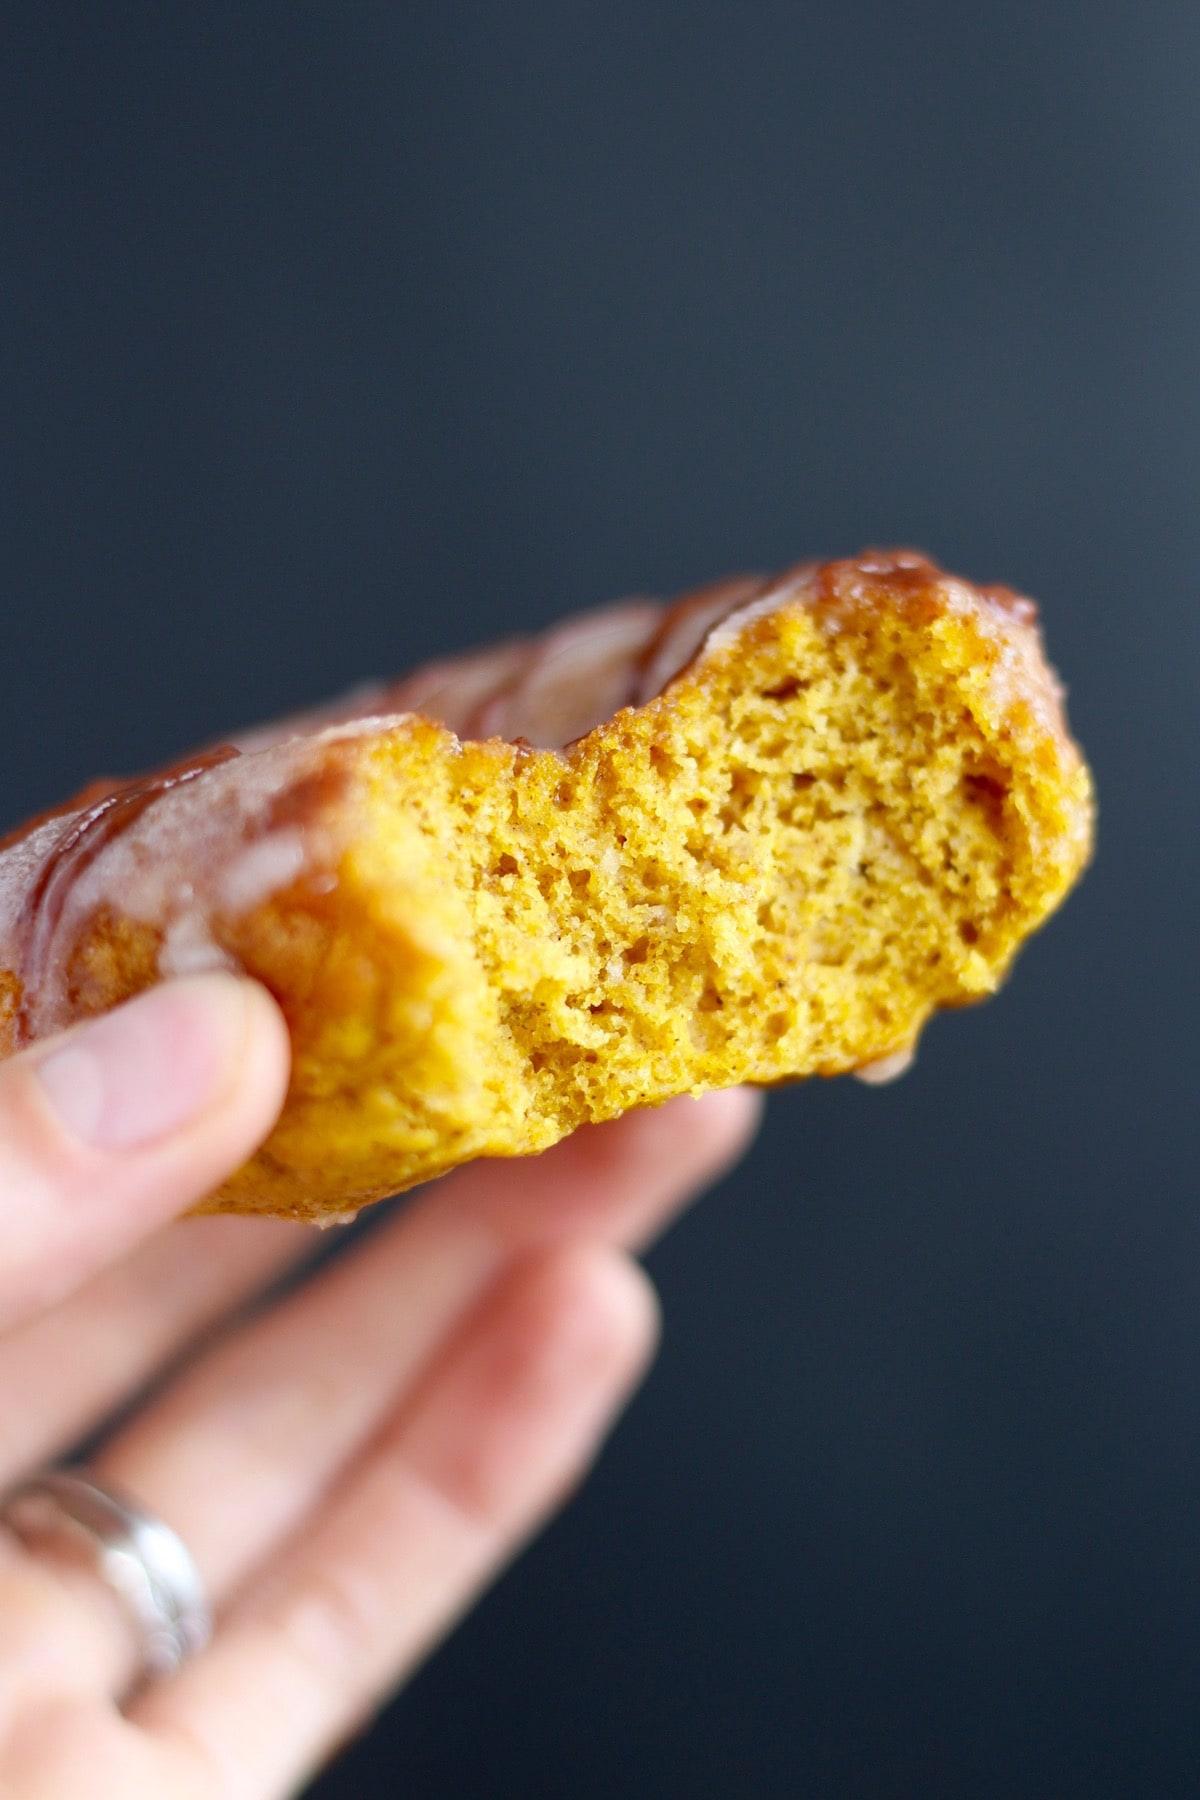 a bite taken out of a Glazed Pumpkin Baked Donut